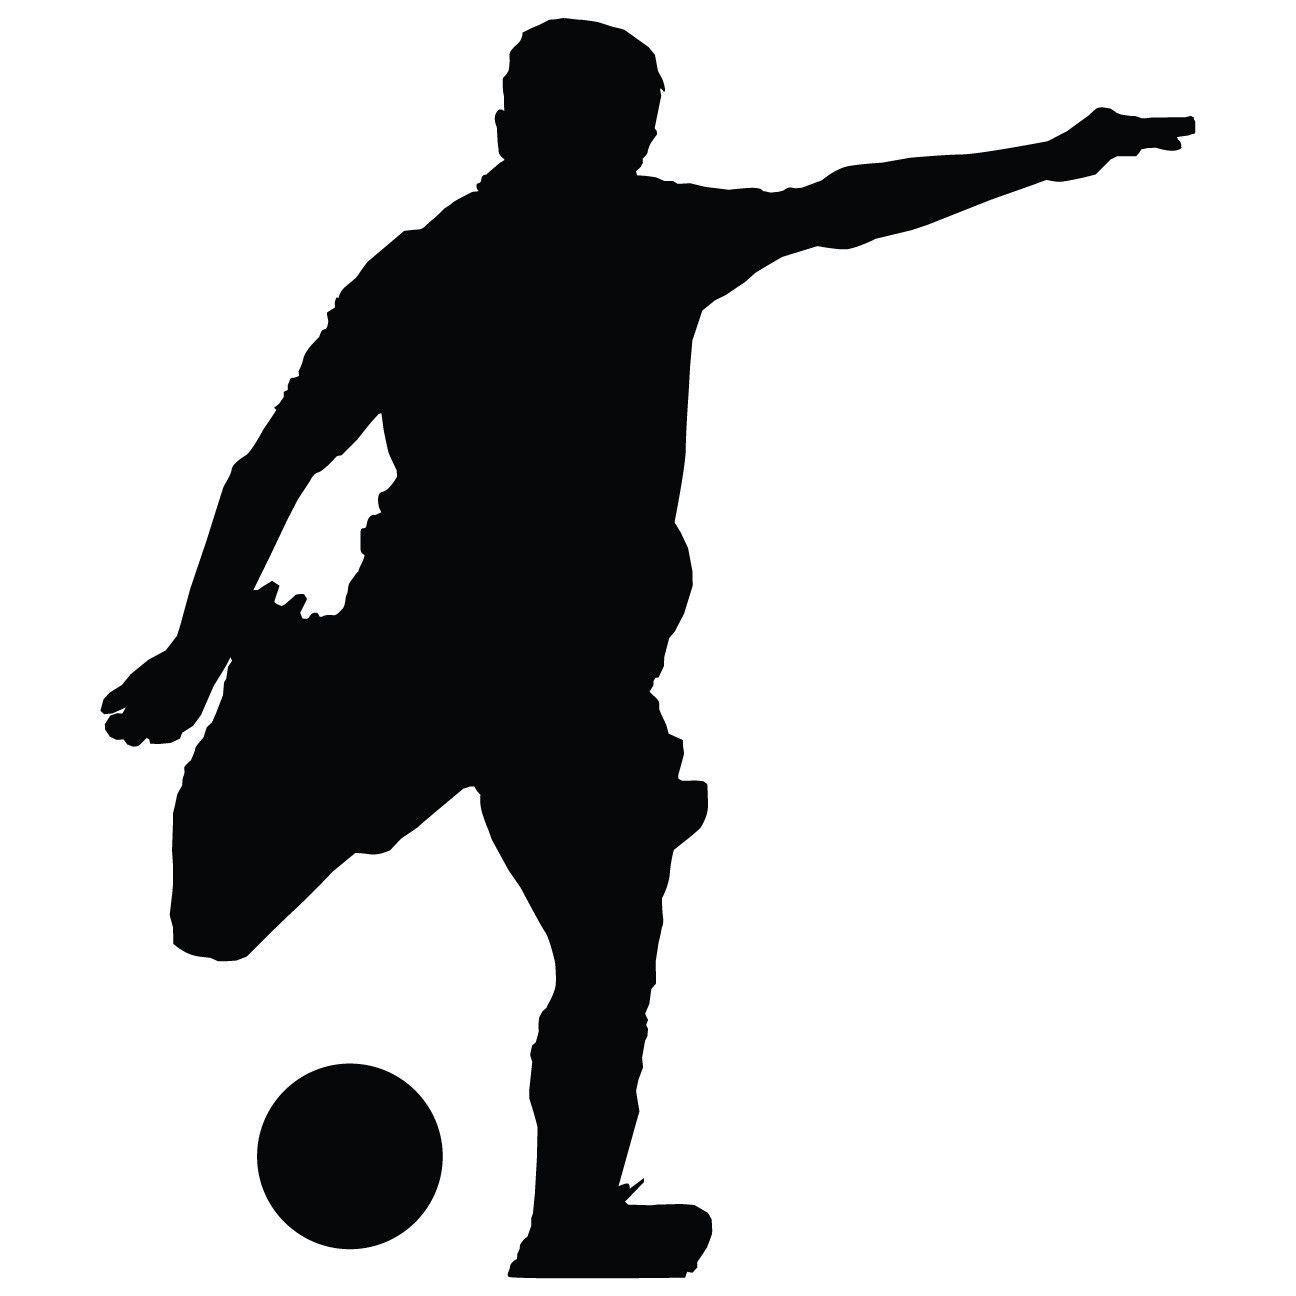 Soccer Wall Decal - Man Futbol Player Sticker #00001 ...